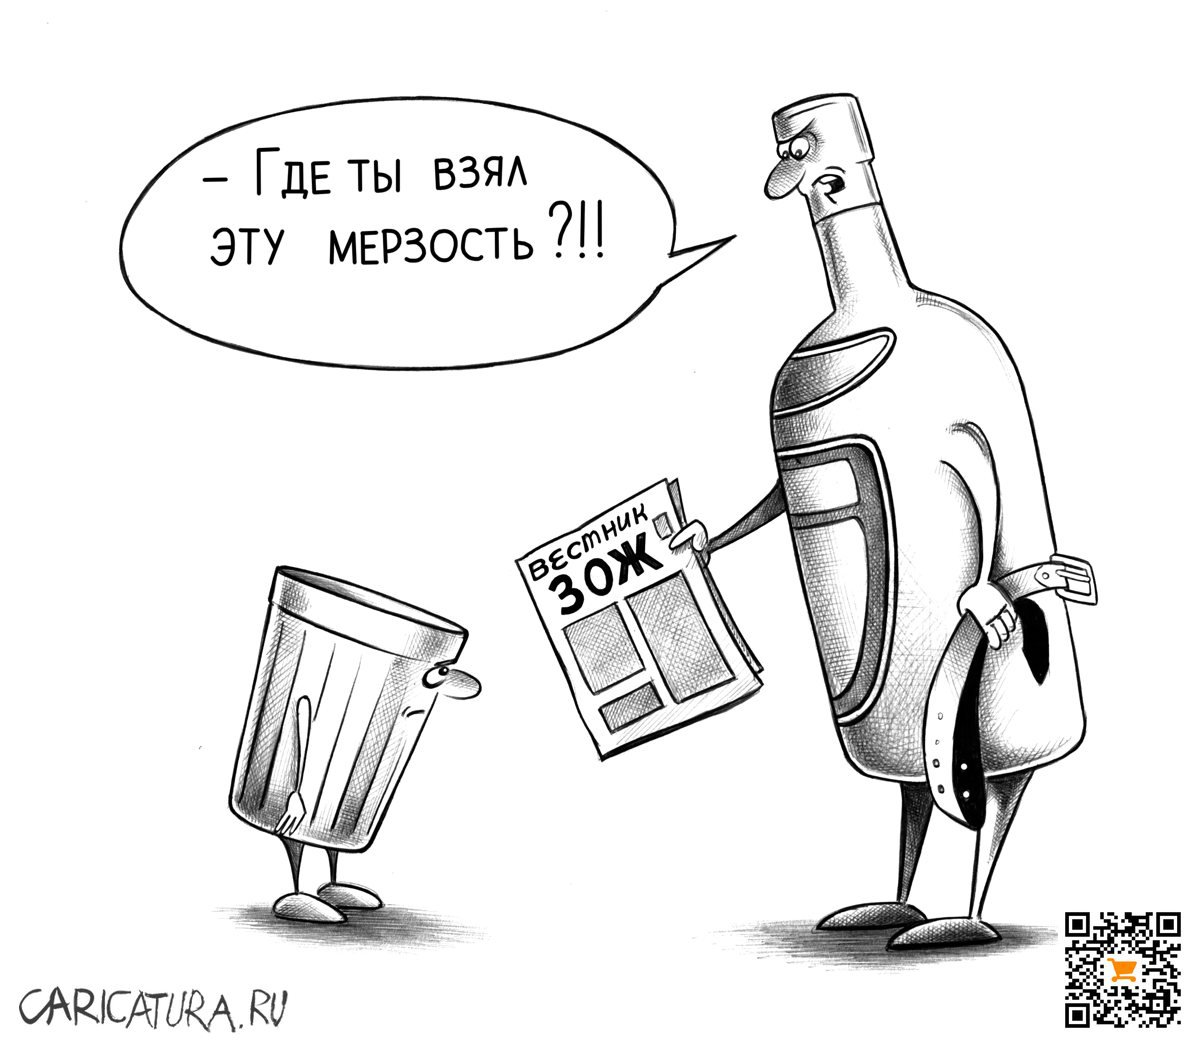 karikatura-merzost_(sergey-korsun)_33635